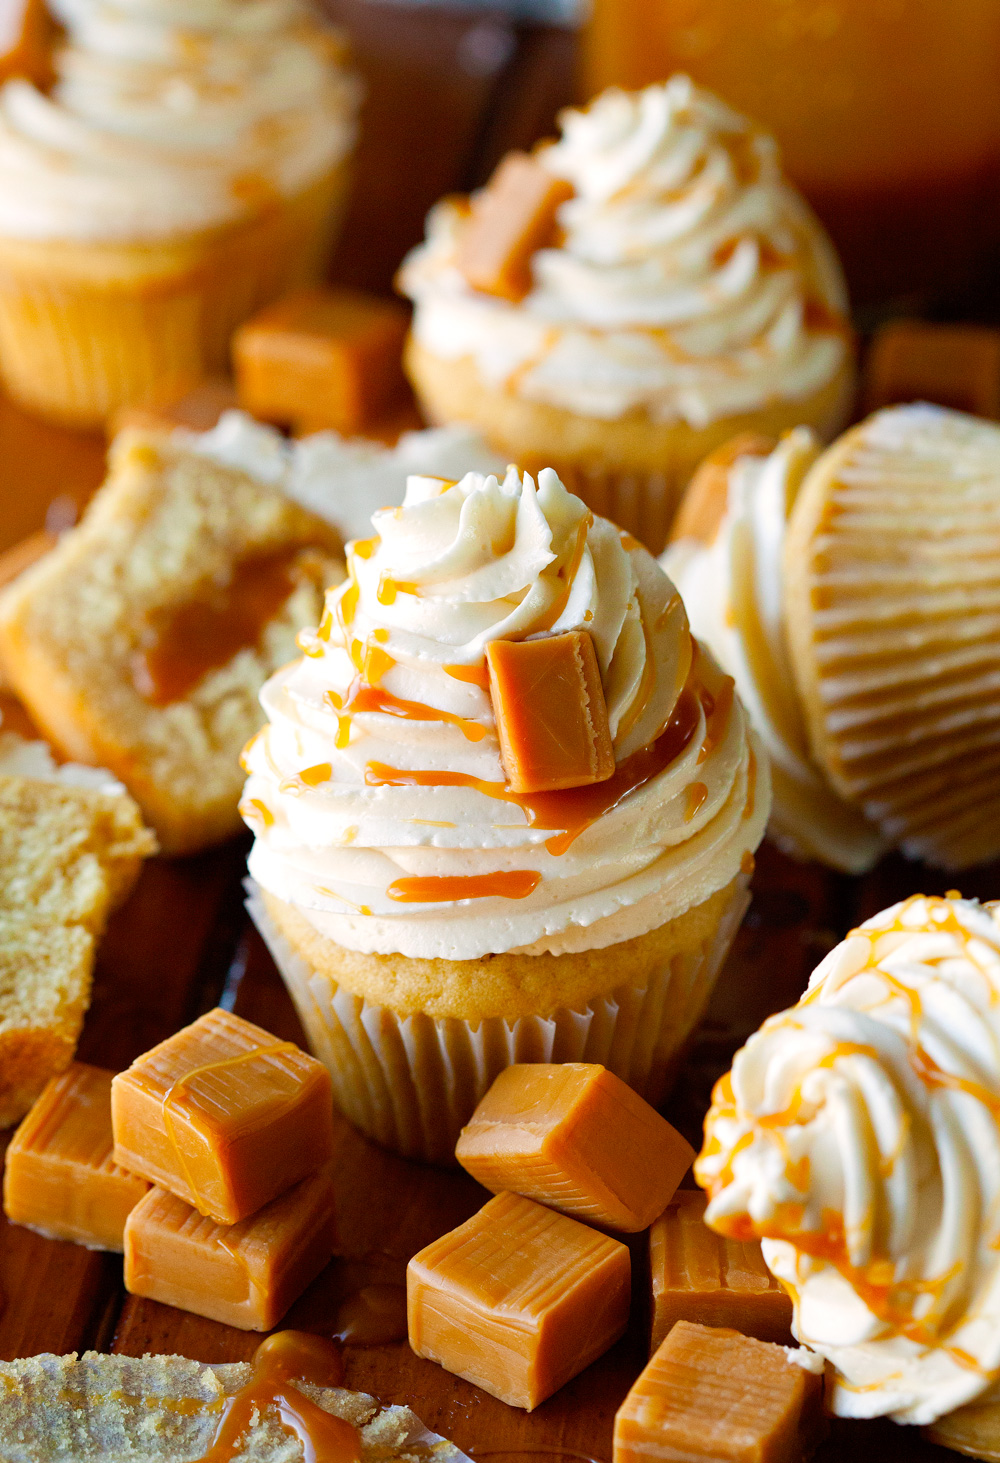 25 Salted Caramel Desserts